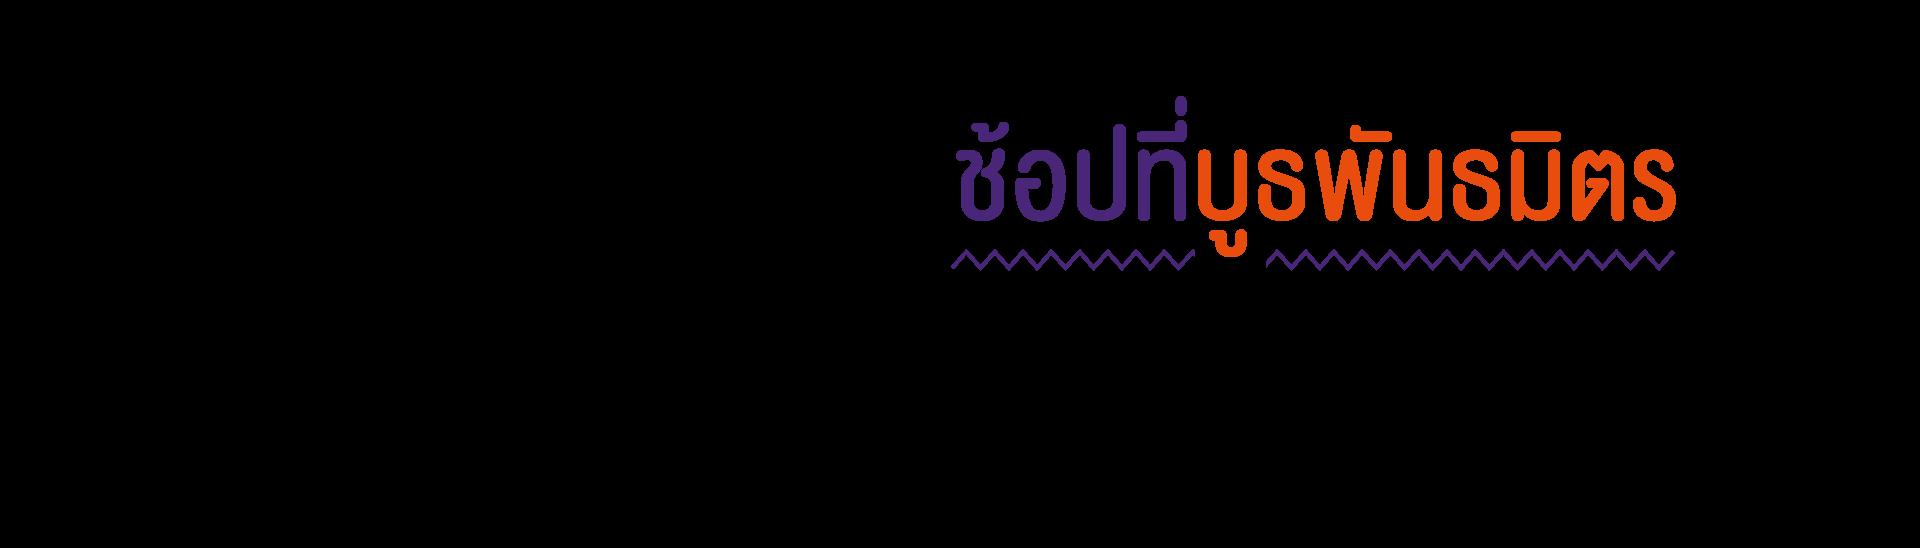 ShopAtPantamit-Name